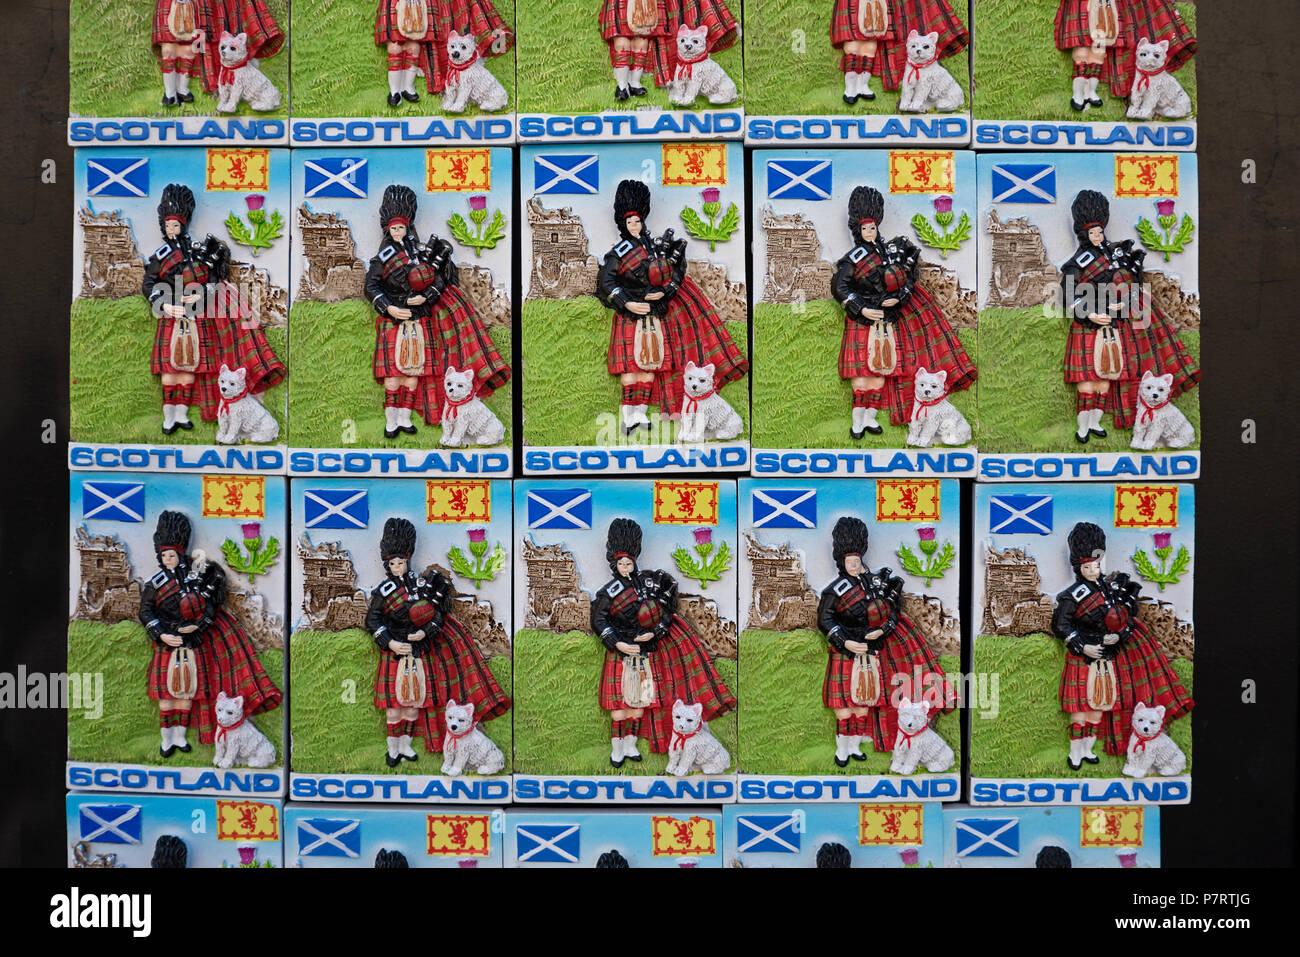 Scottish fridge magnets for sale on the Roal Mile in Edinburgh, Scotland, UK. - Stock Image